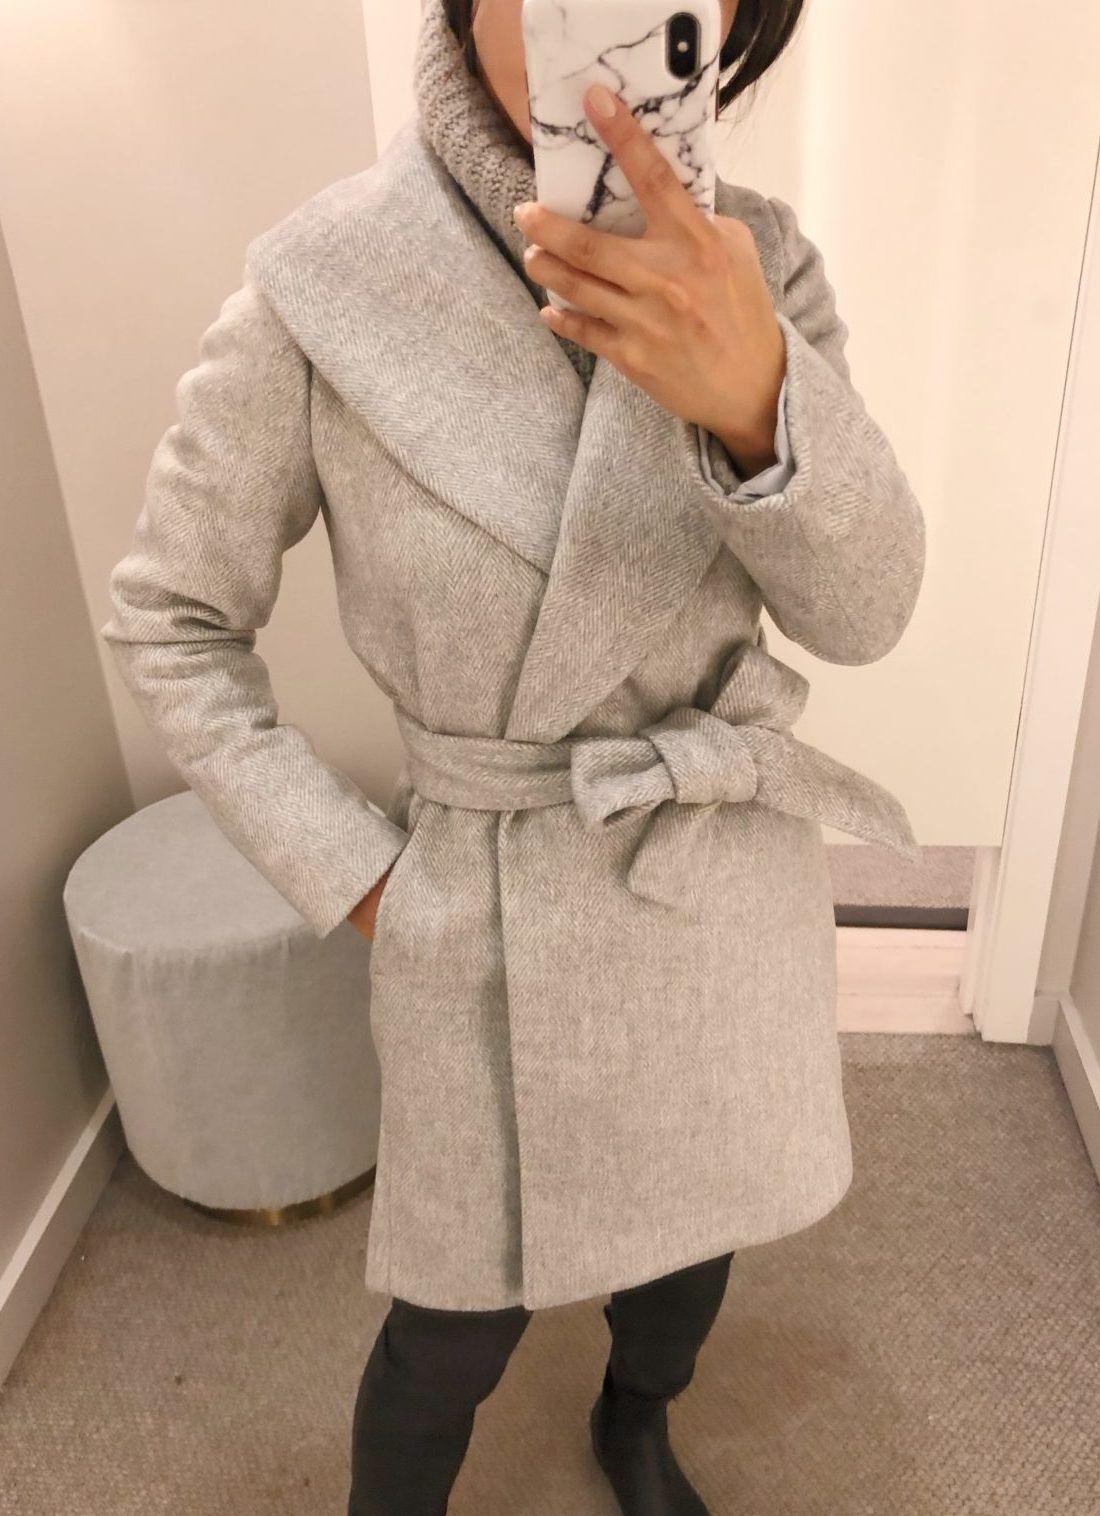 Ann Taylor Petite Winter Coat Try Ons On Sale Stylish Winter Coats Petite Winter Coats Winter Coat [ 1516 x 1100 Pixel ]